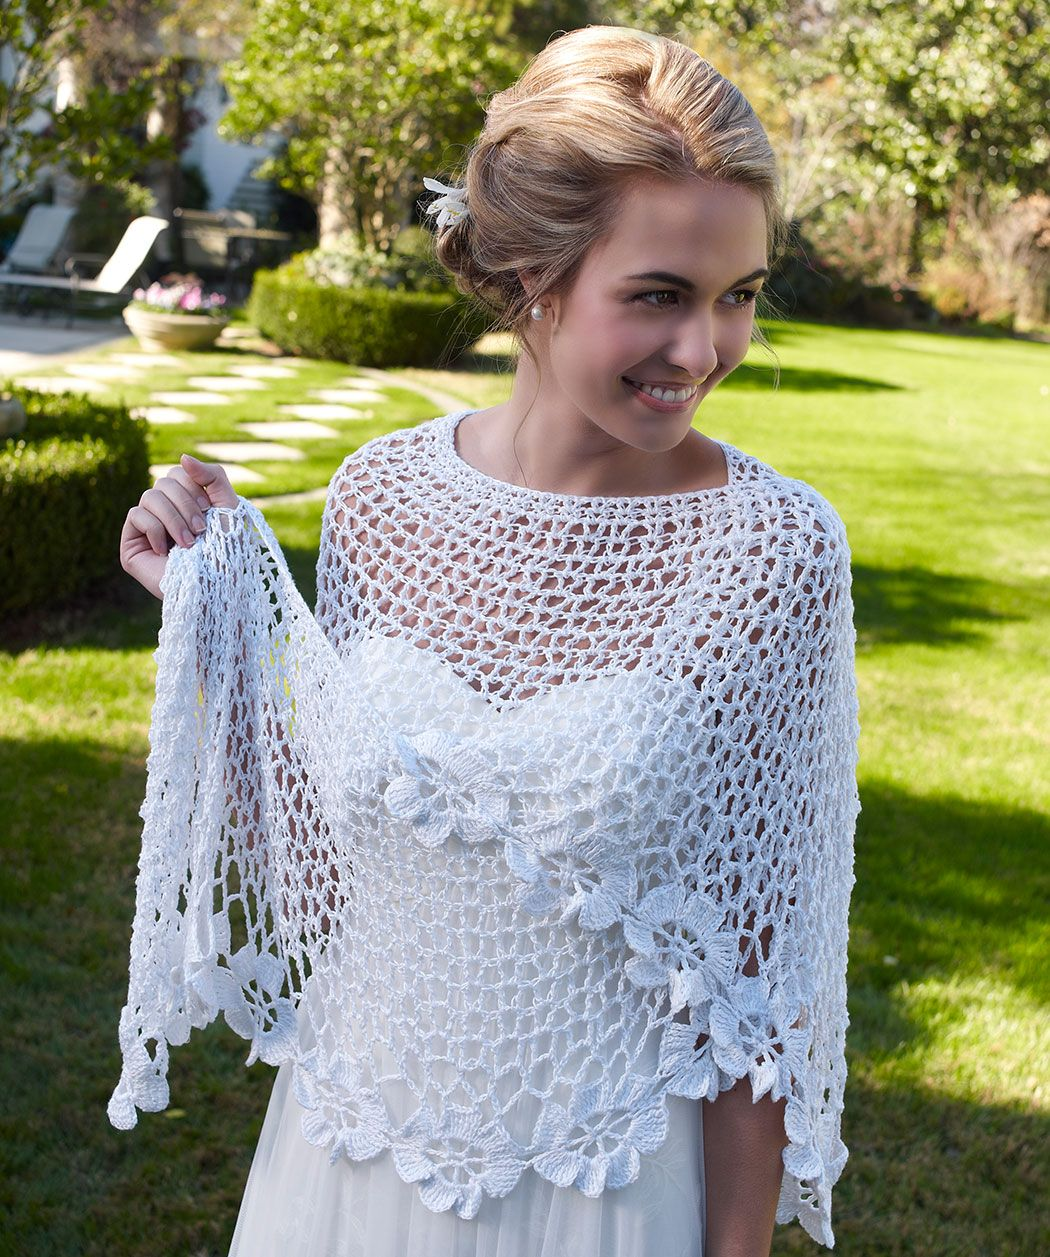 Bridal Shawl Free Crochet Pattern From Red Heart Yarns